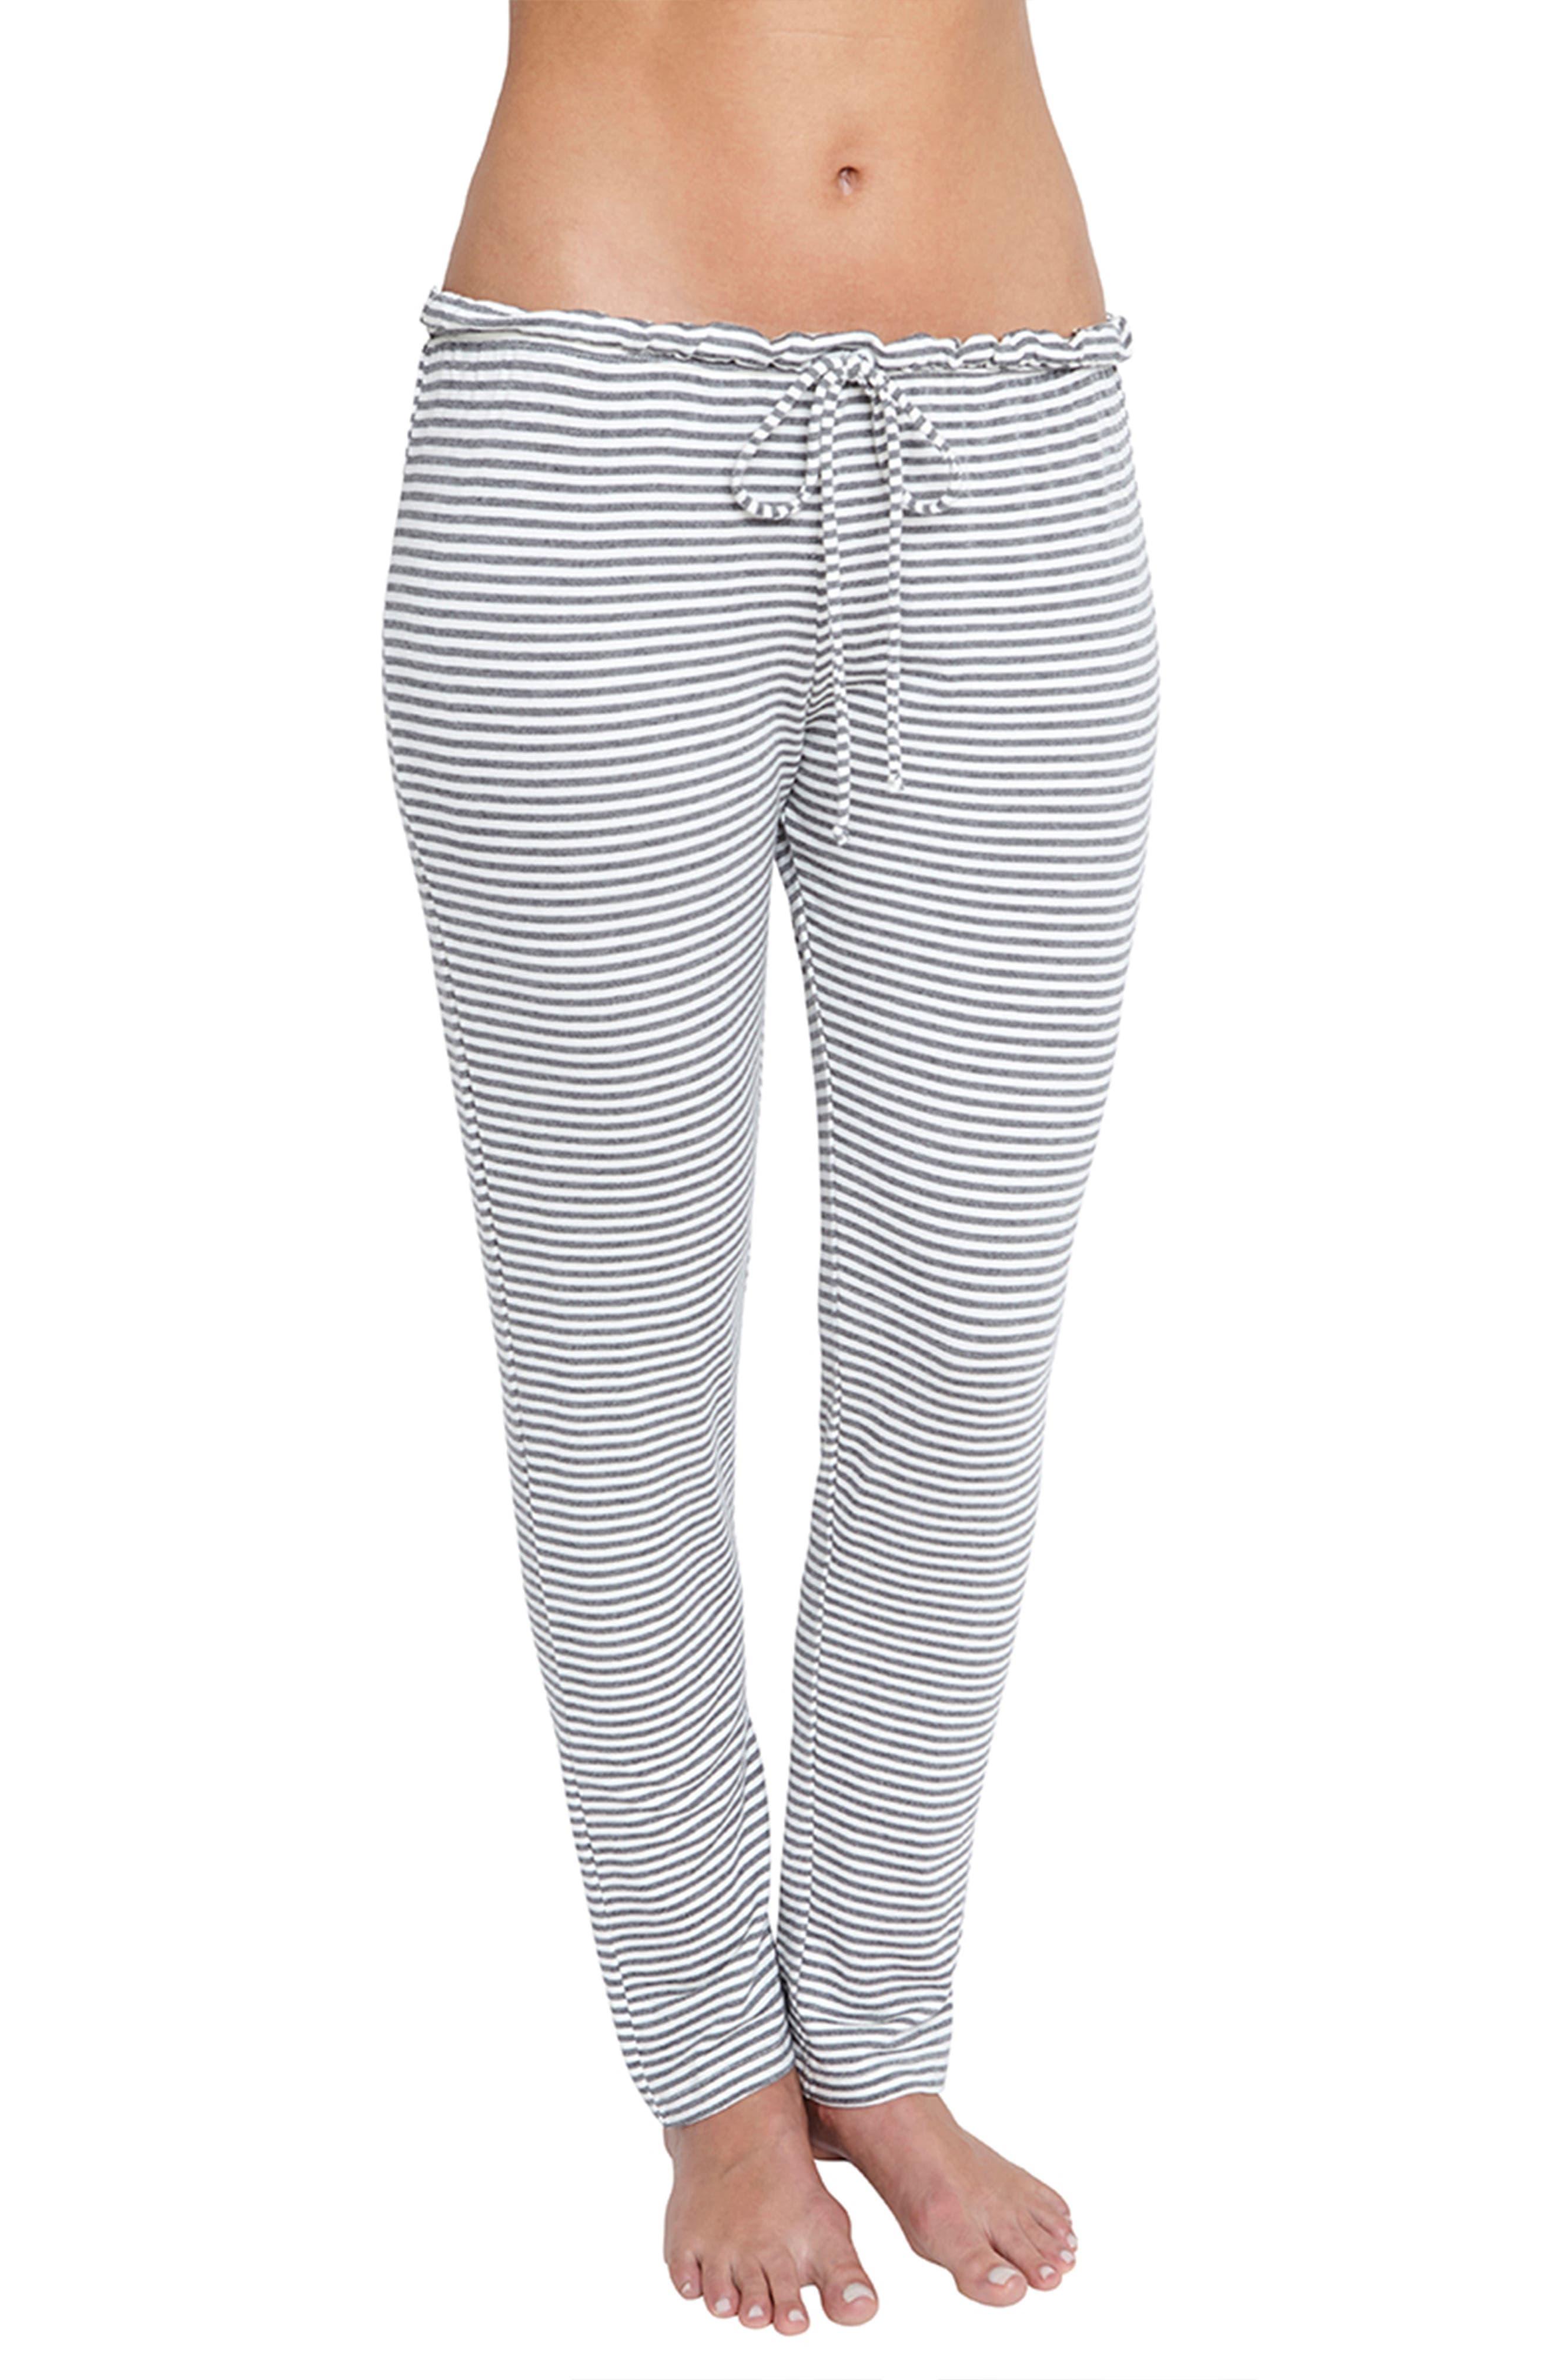 Sadie Stripes Pajama Pants,                         Main,                         color,